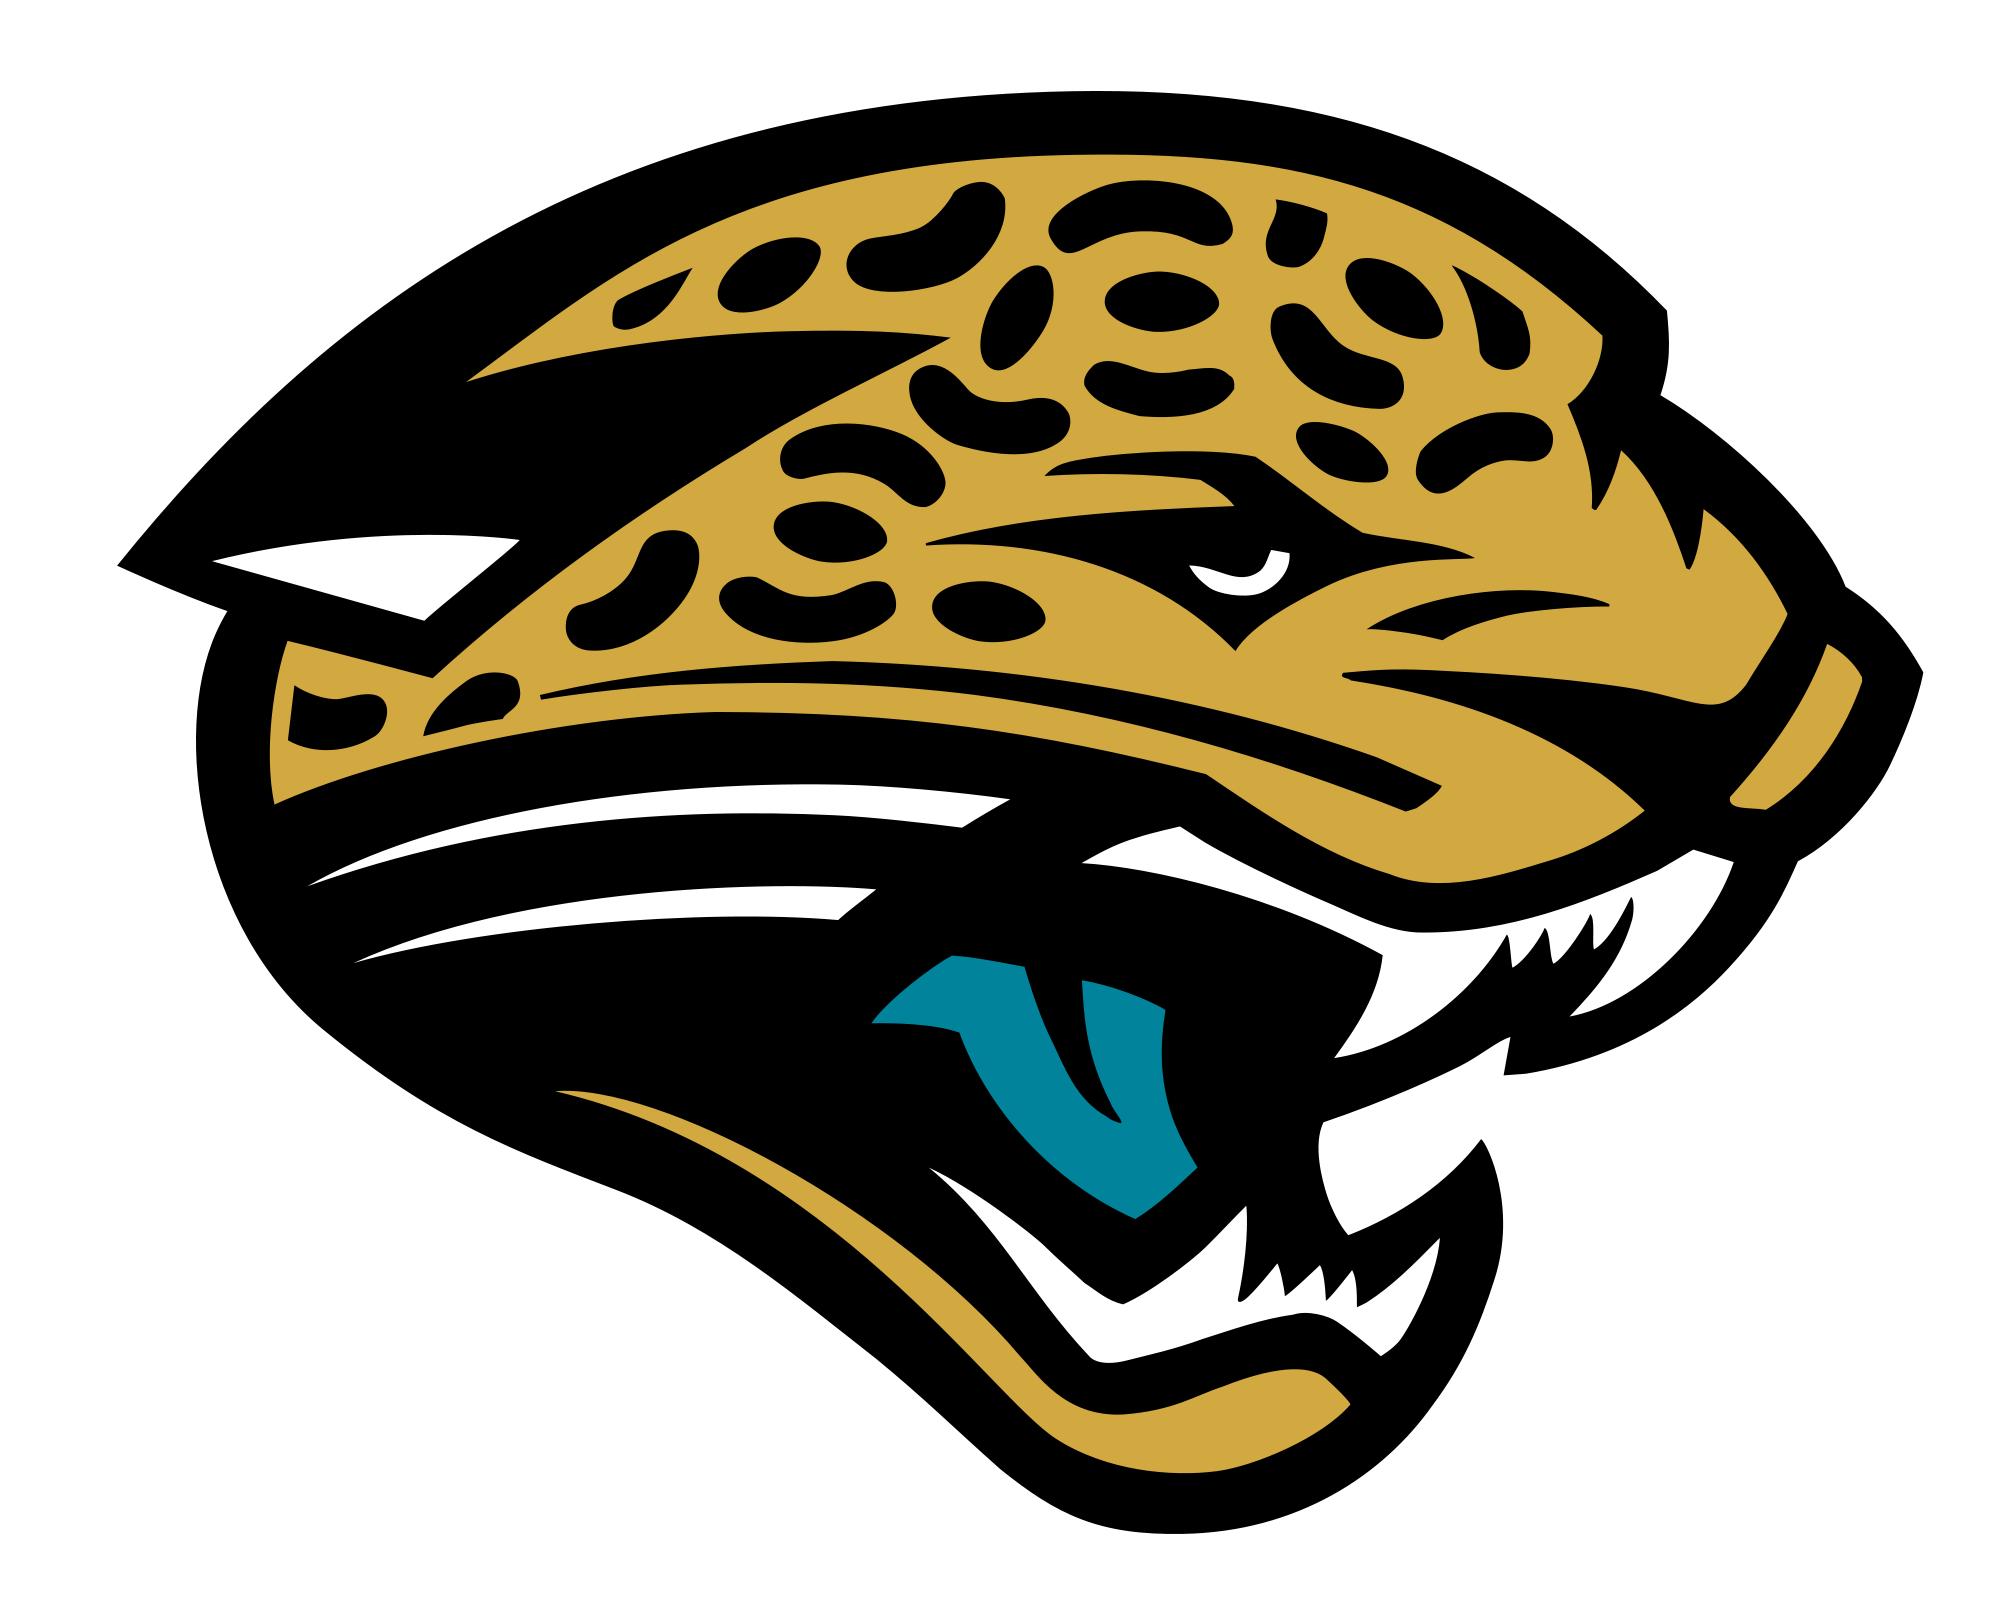 Jacksonville Jaguars Logo Wallpapers ImageBankbiz 2000x1608